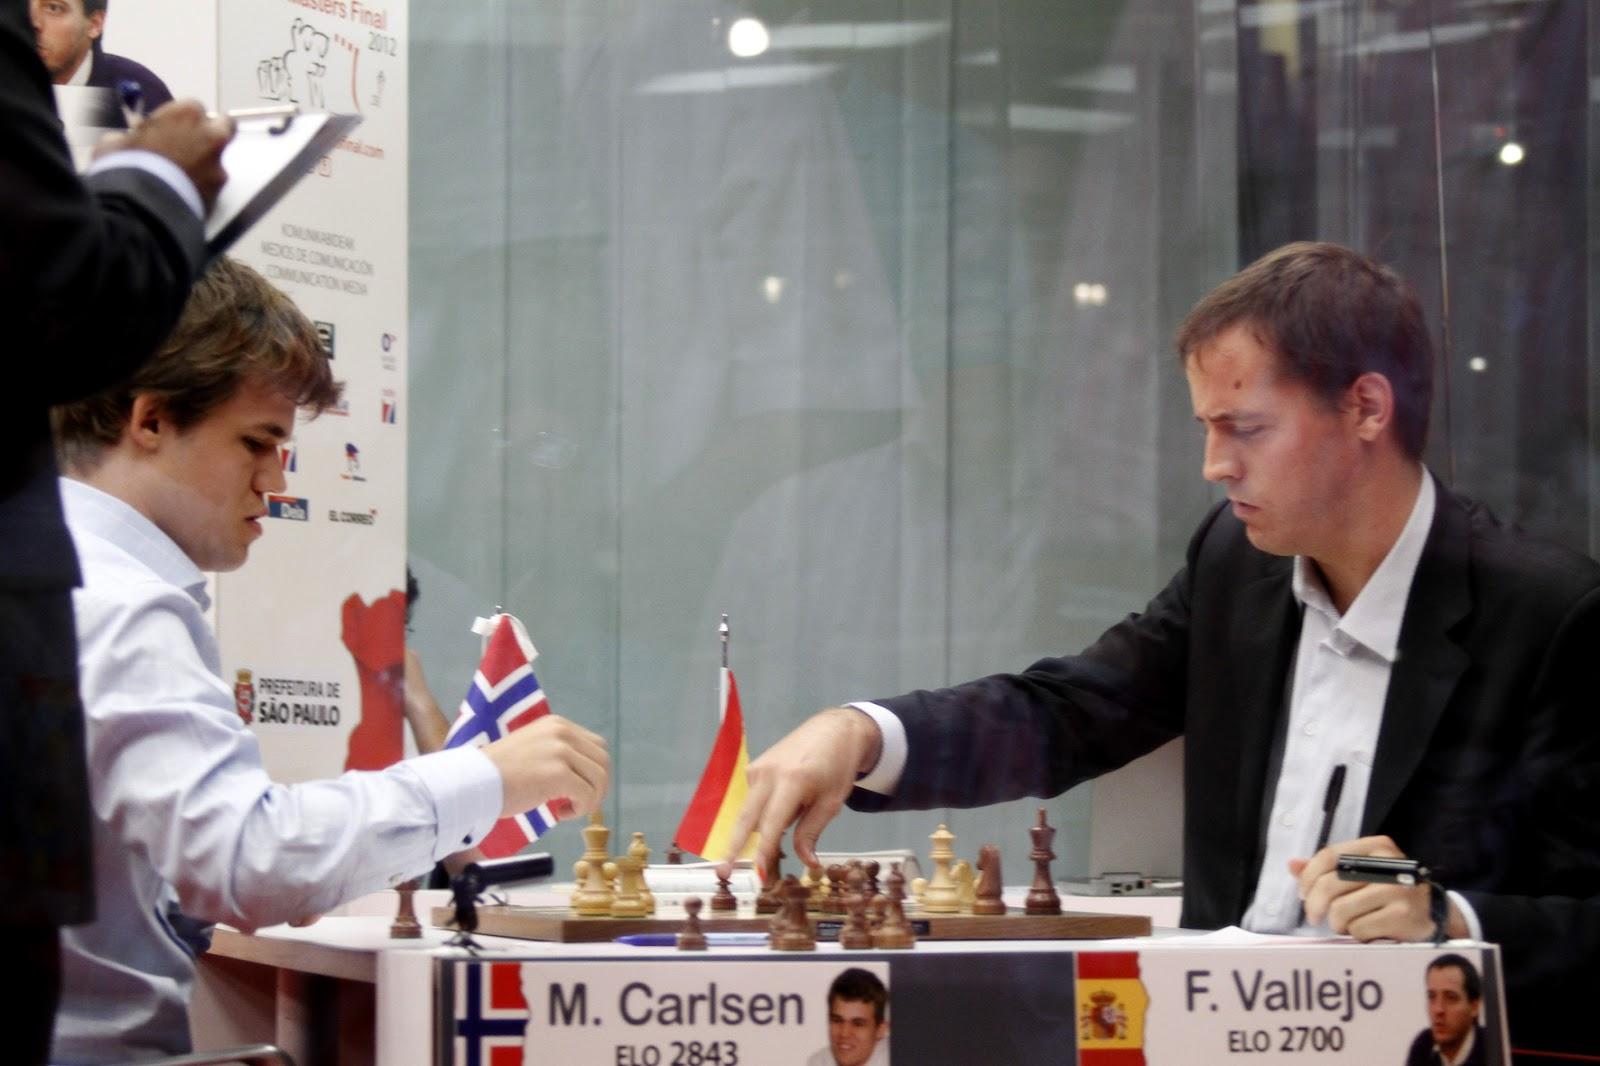 Carlsen Aronian Bilbao 2012